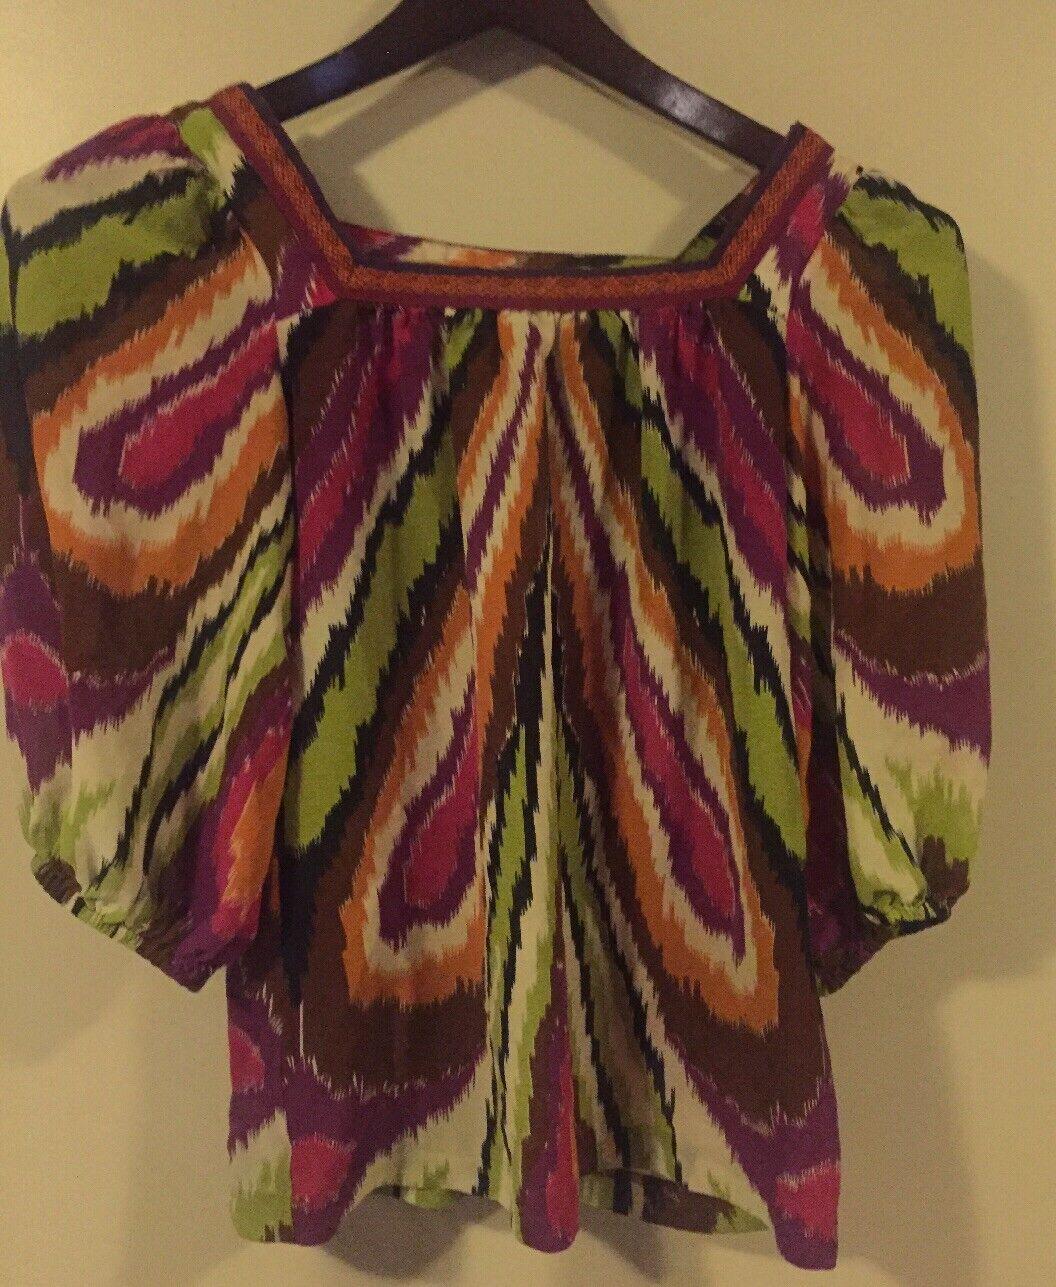 damen Silk Trina Turk butterfly puff sleeves top in multi-Farbe art print